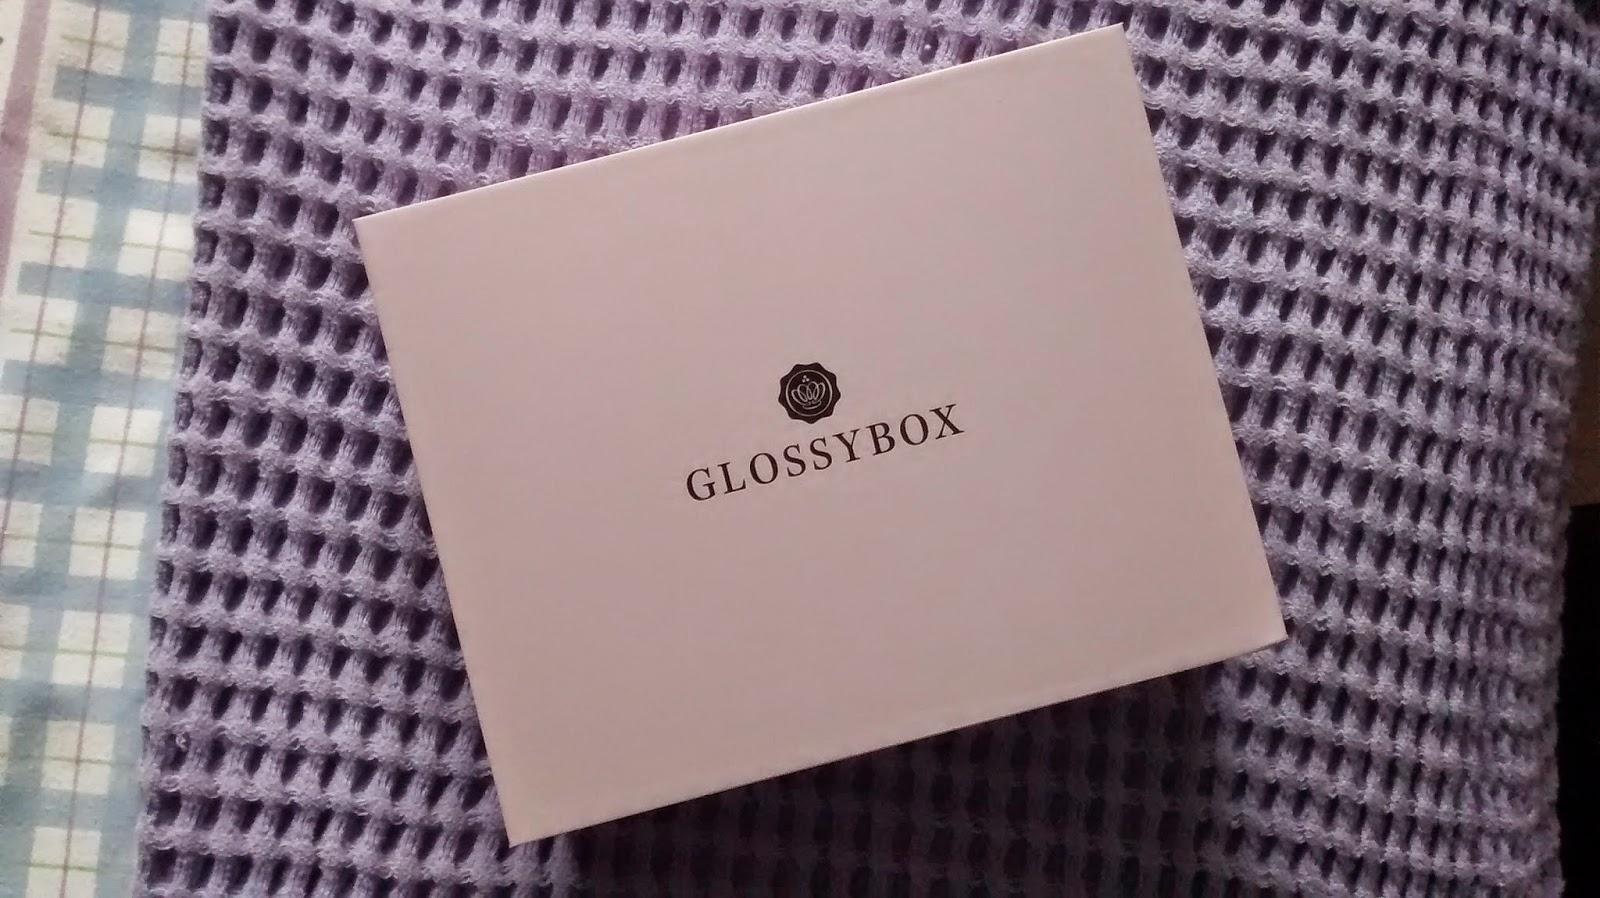 August Glossybox